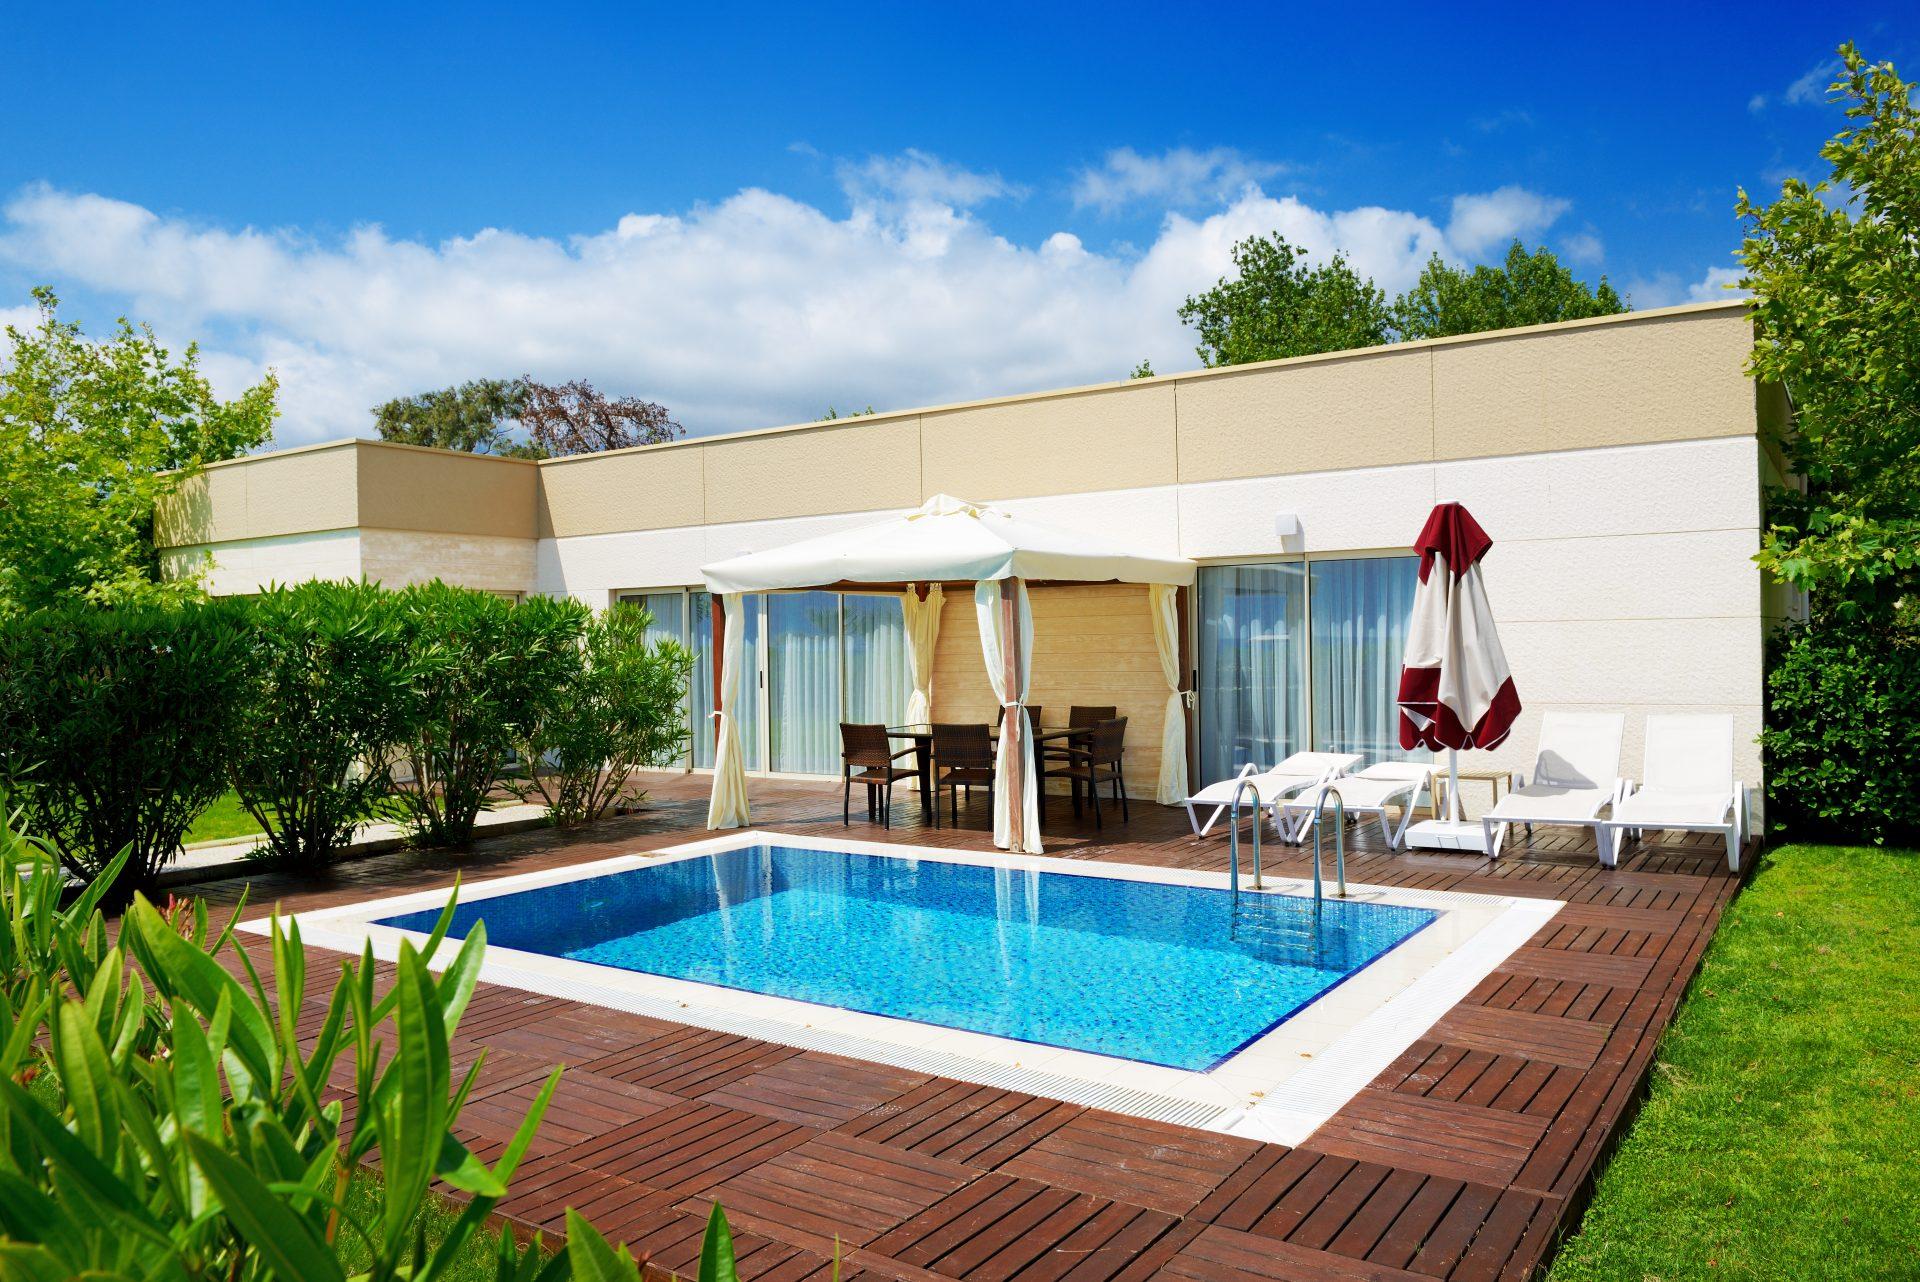 piscine externe